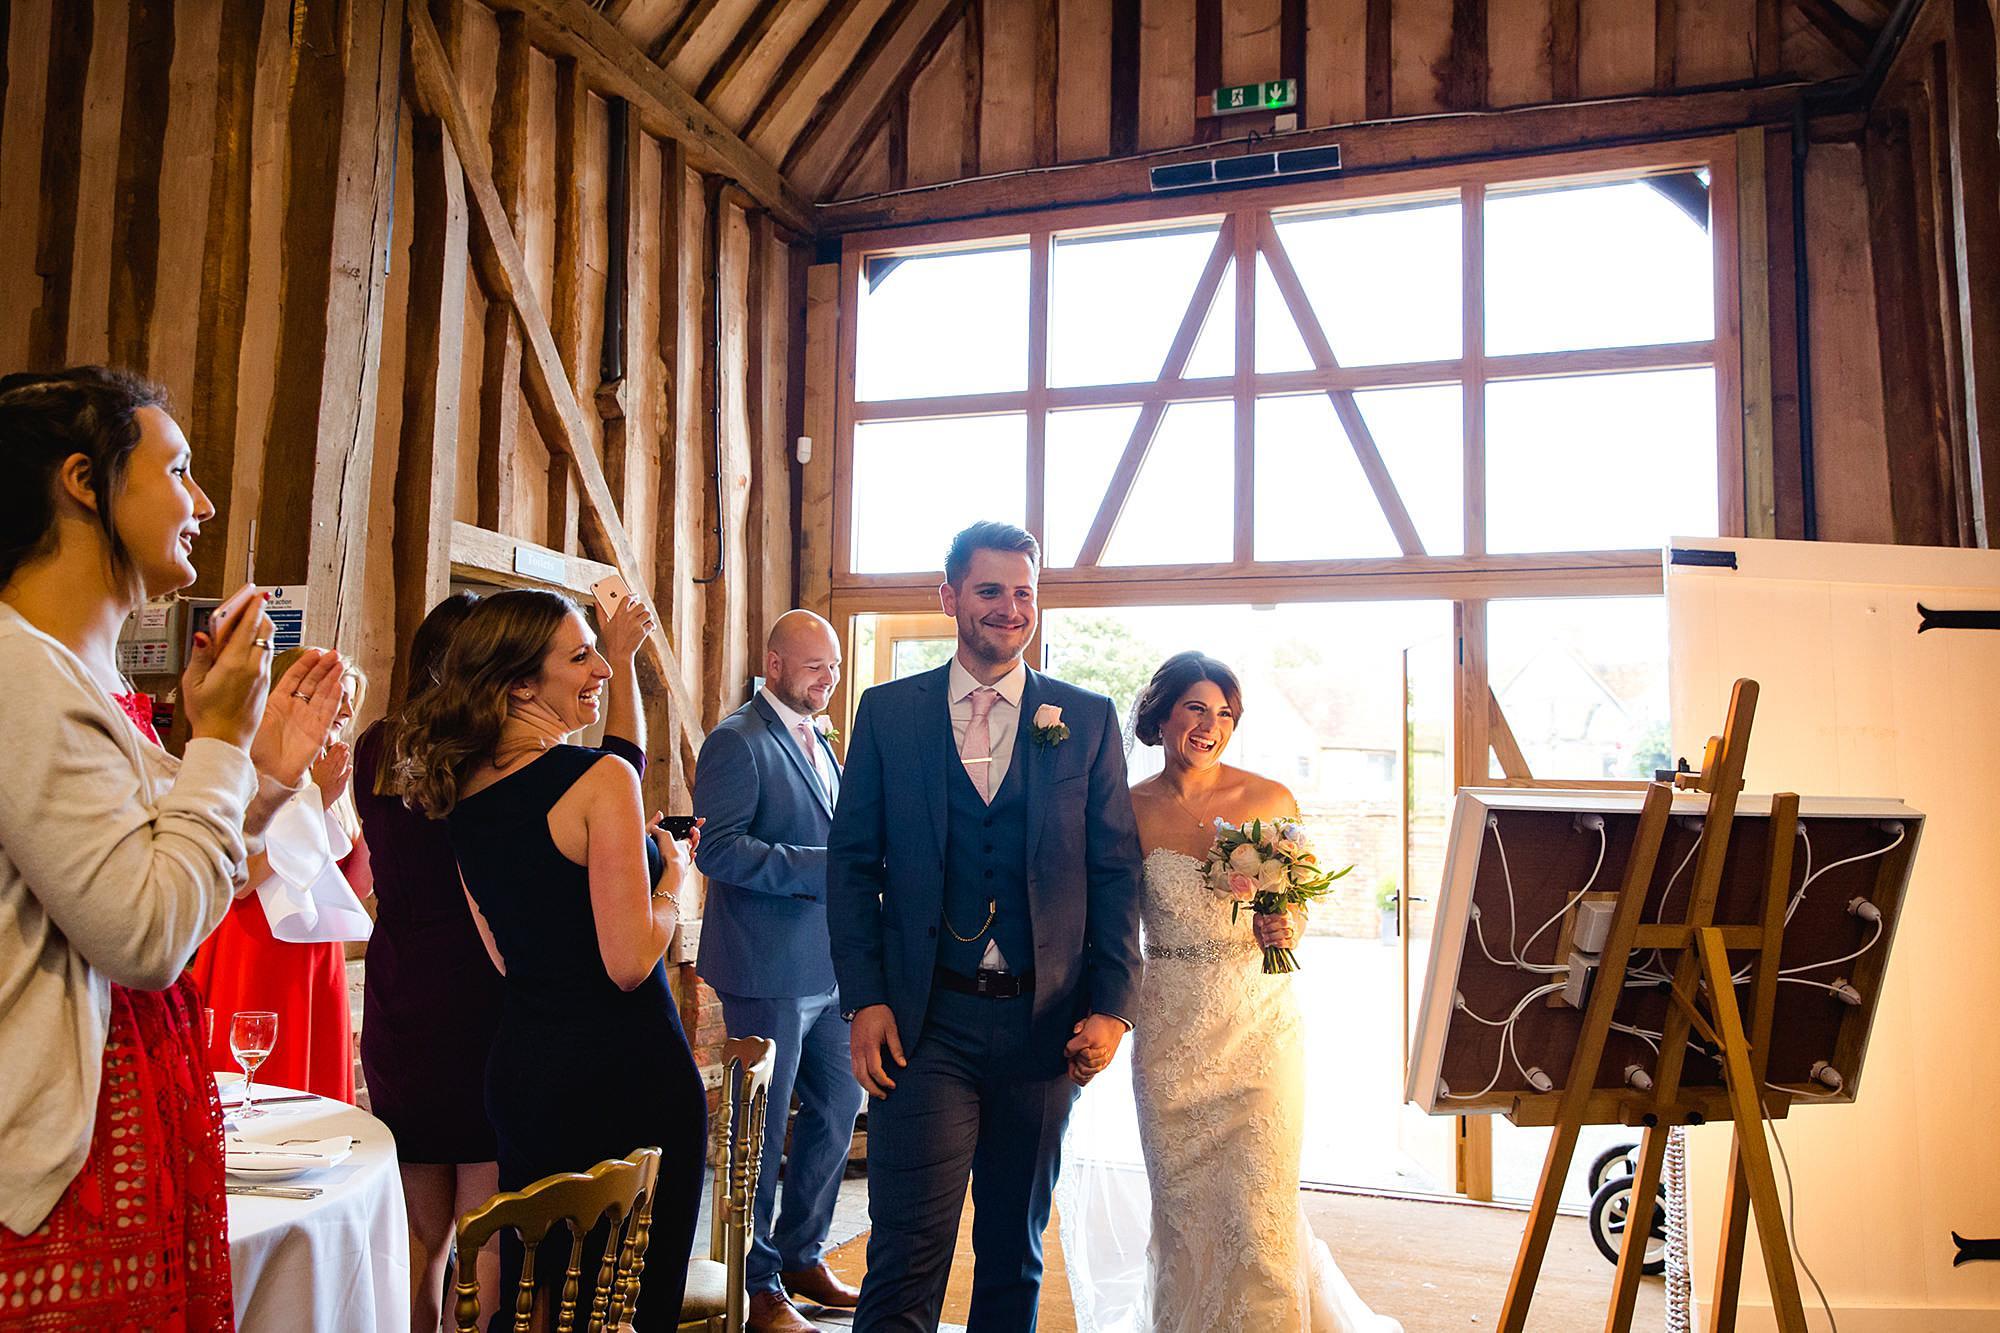 Lillibrooke Manor wedding bride and groom enter wedding breakfast